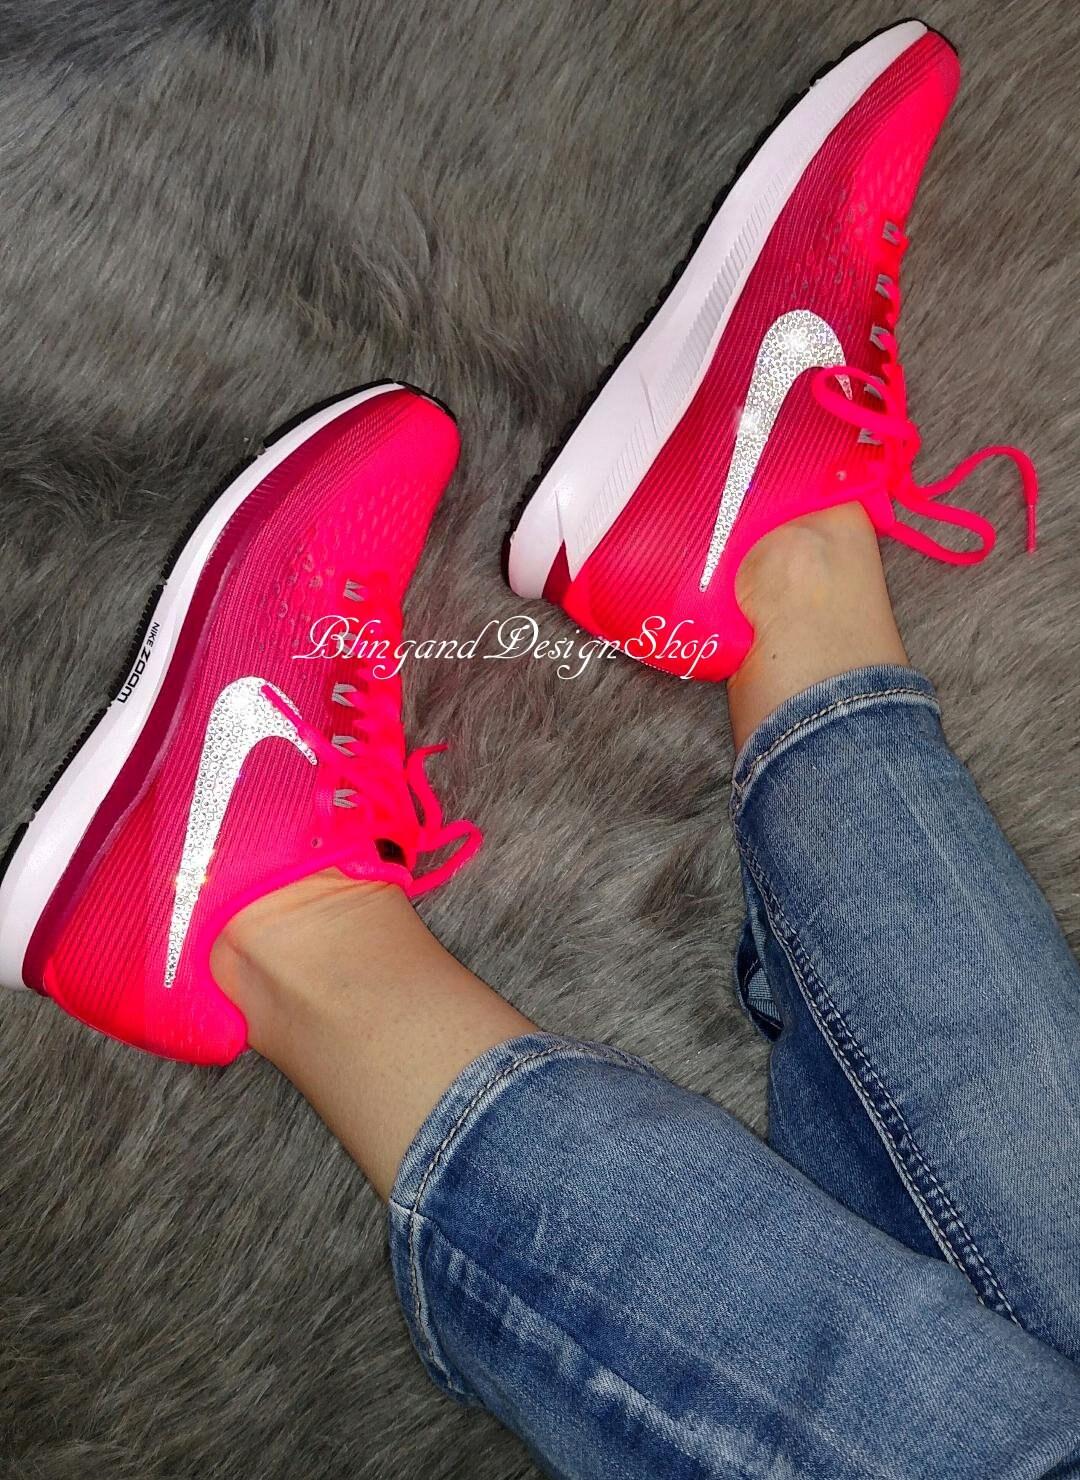 b22cdb3ae404f4 Swarovski Bling Nike Air Zoom Pegasus 34 Women s Nike Shoes Customized with  Swarovski Crystal Rhinestones